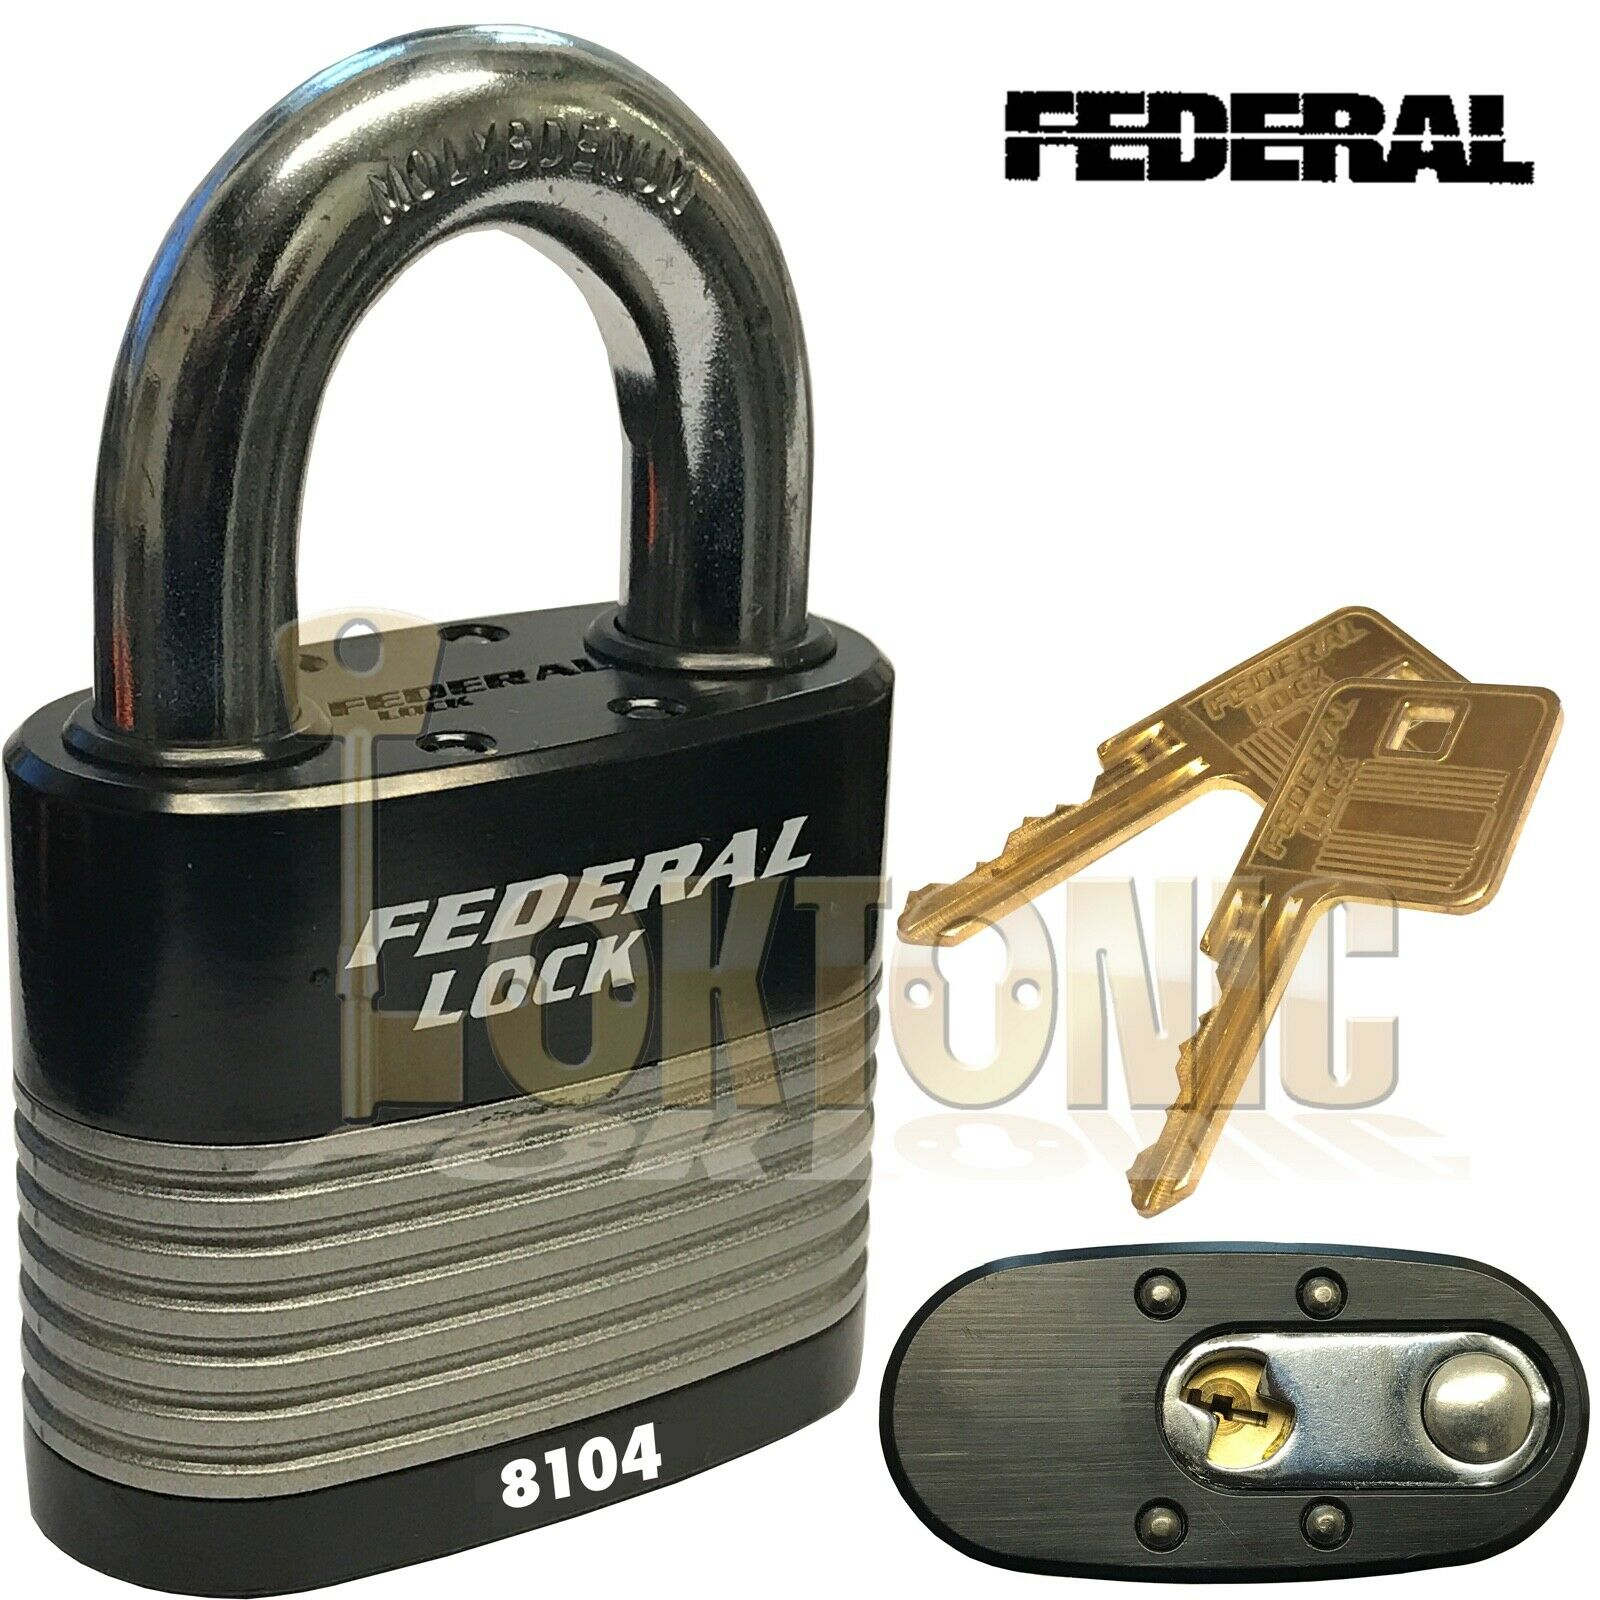 Federal FD8104 High Security 6 Pin Re-Keyable Steel Padlock Gates Shed Garage